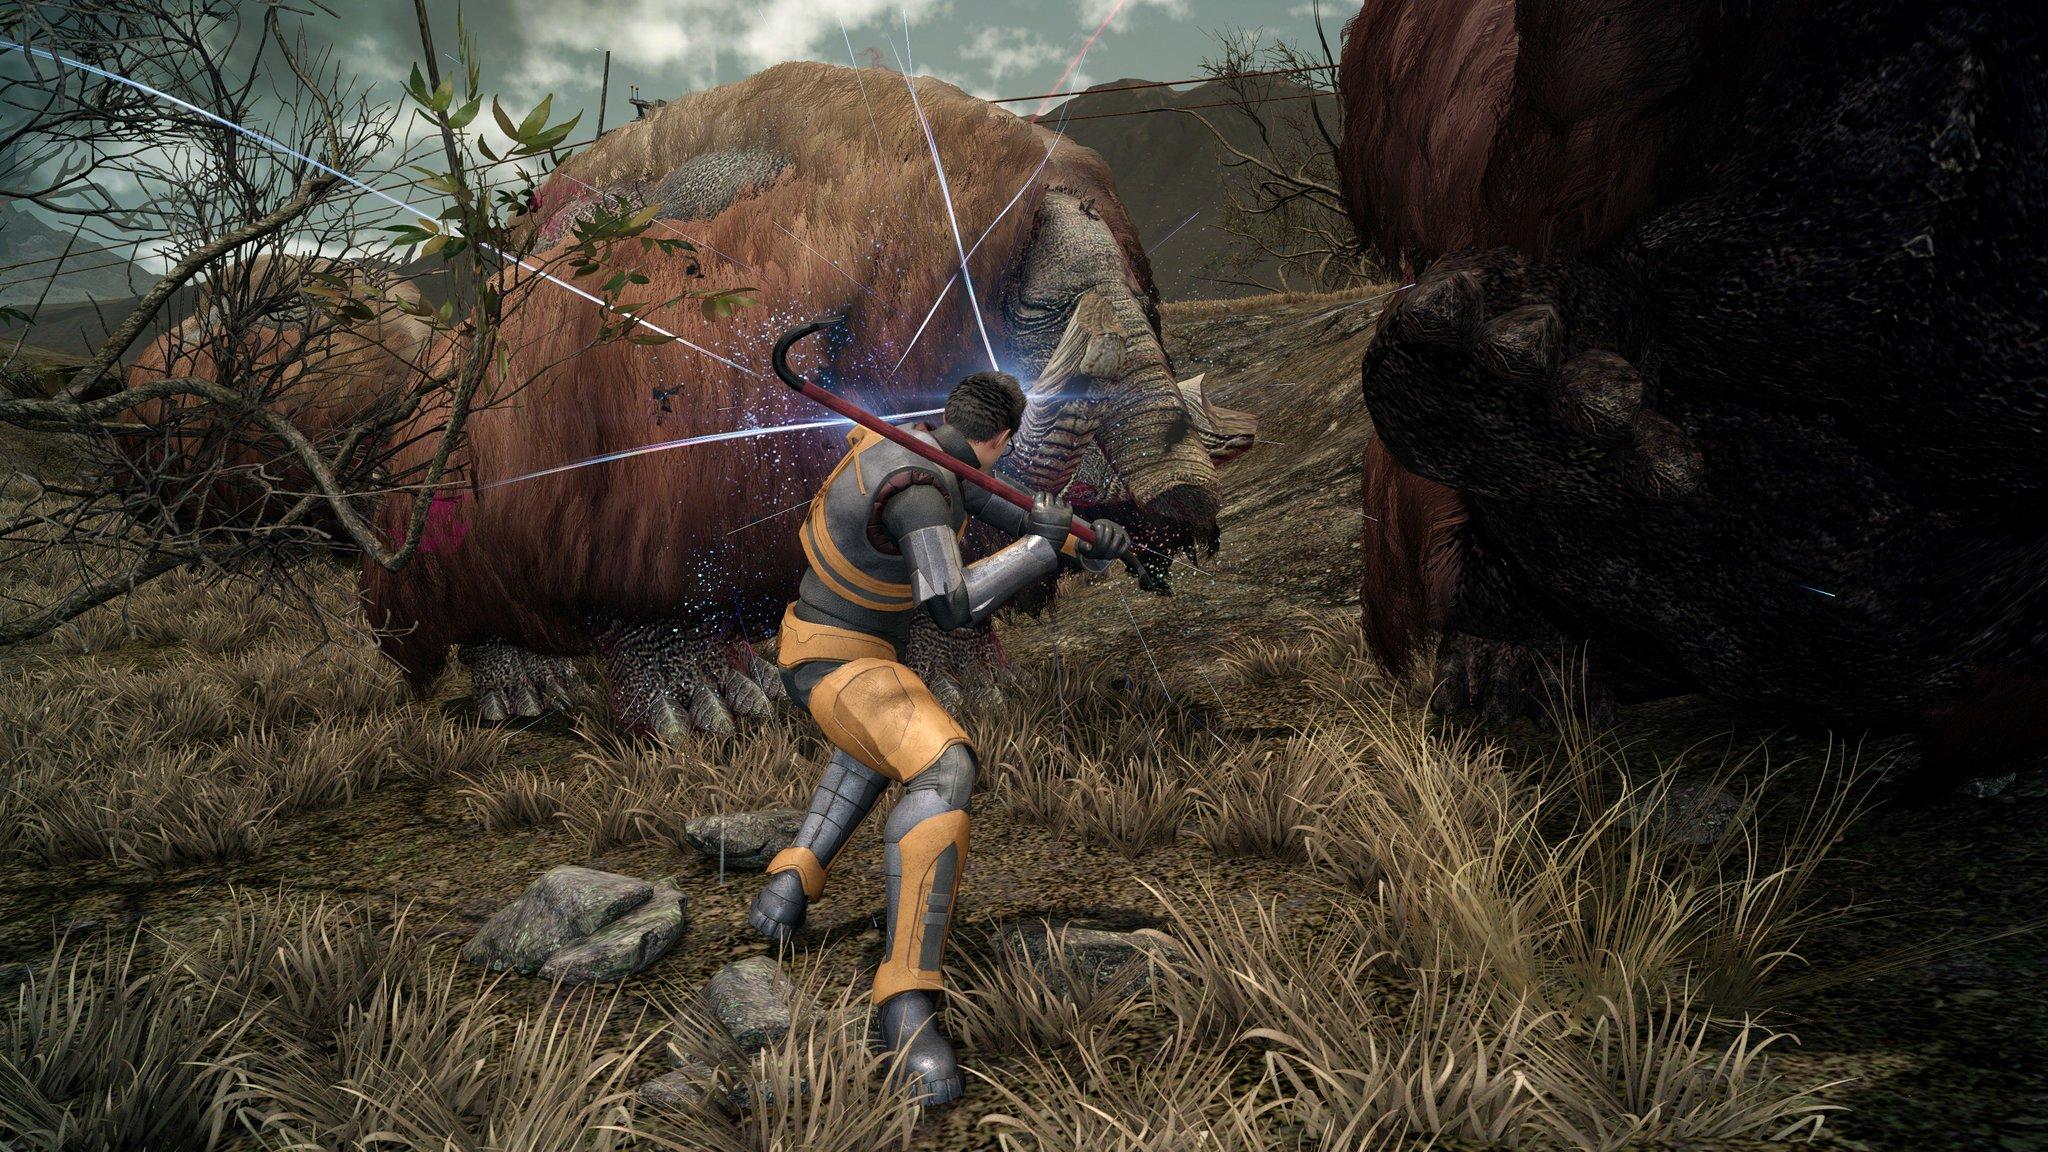 Final Fantasy XV para PC terá itens de Half-Life  https://t.co/7Y44N1TUlg https://t.co/5OugwBuSYj